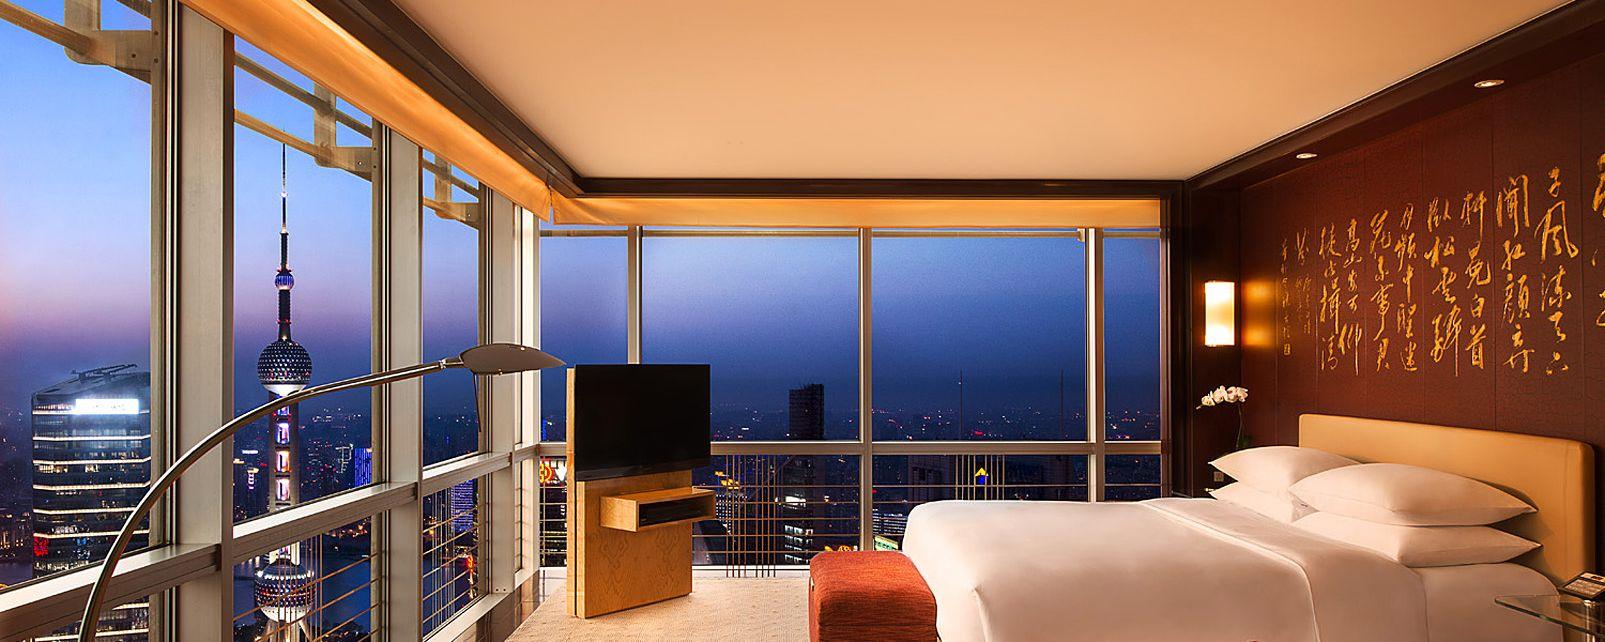 Hôtel Grand Hyatt Shanghai